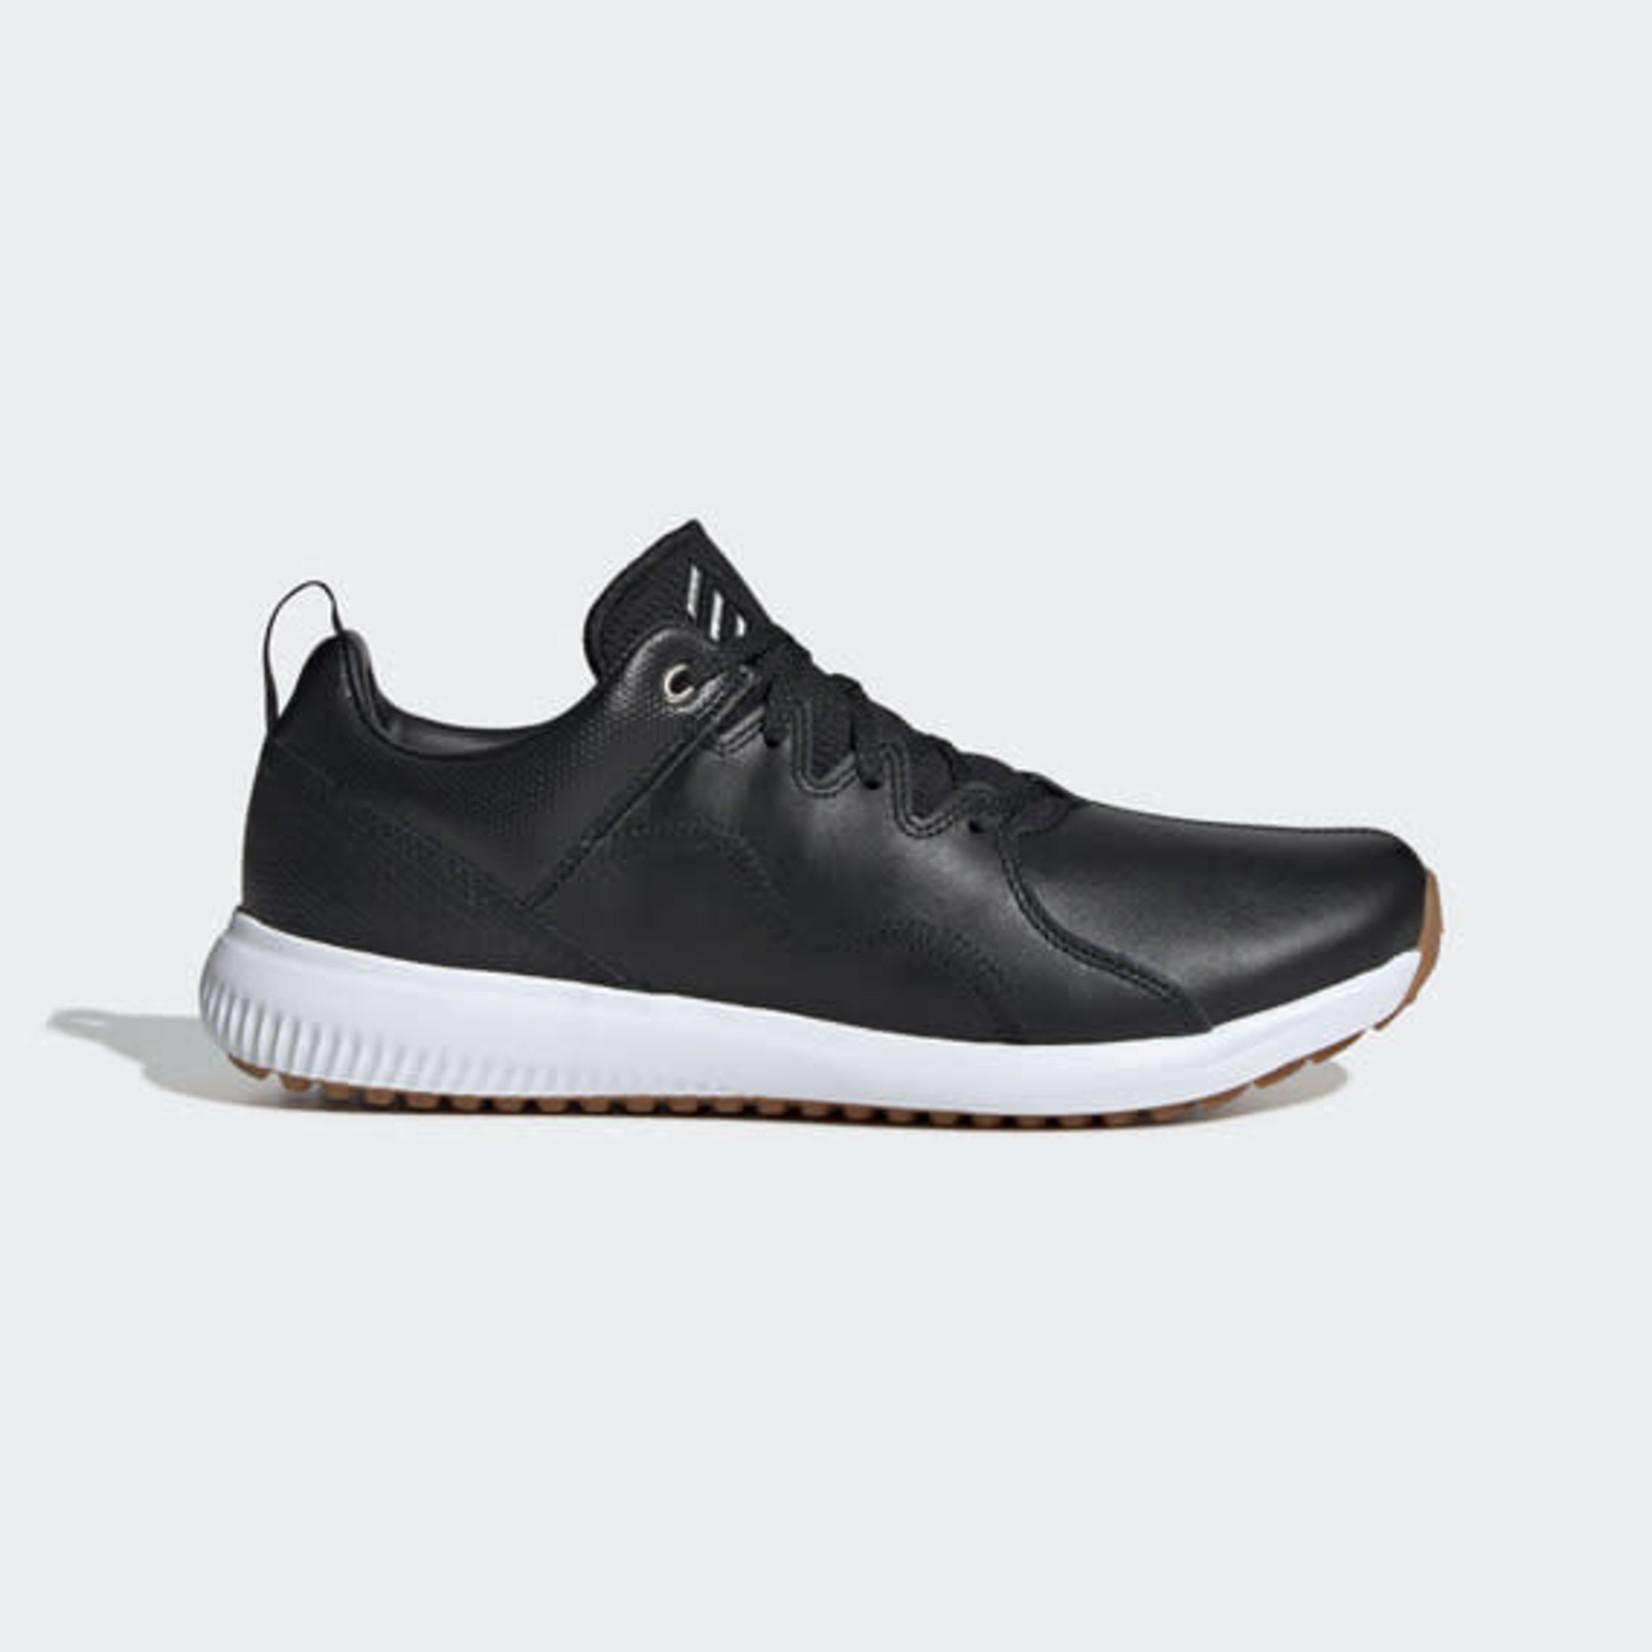 Adidas Adidas ADICROSS PPF Black/White UK: 12 / EU : 47,3